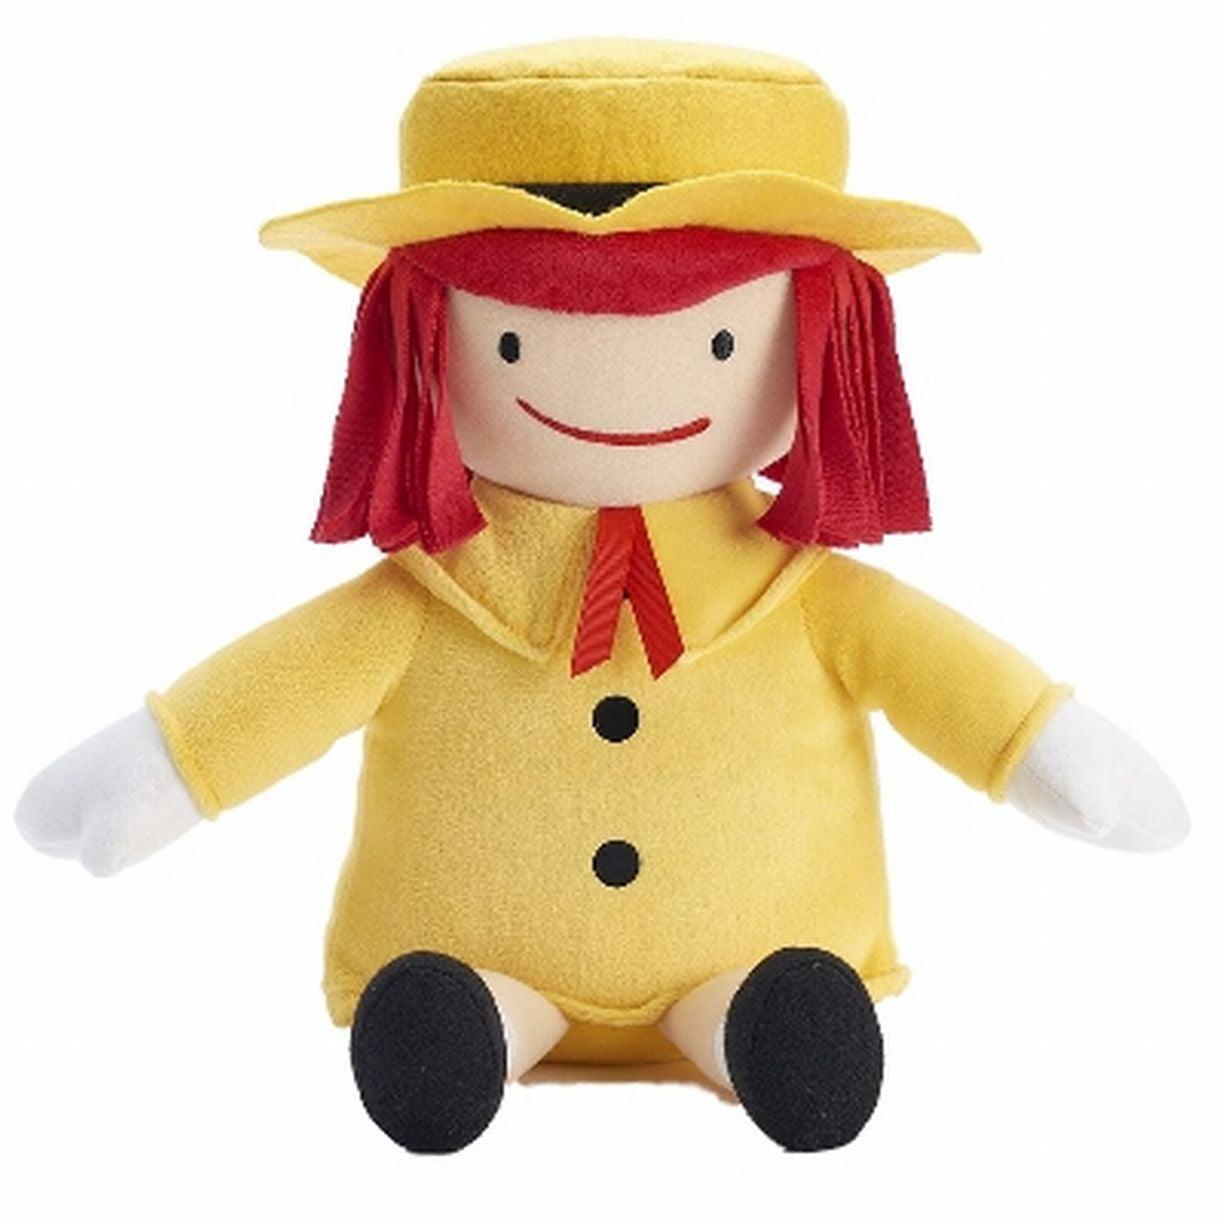 Kohls Cares Madeline Stuffed Doll Plush Pal by Kohls